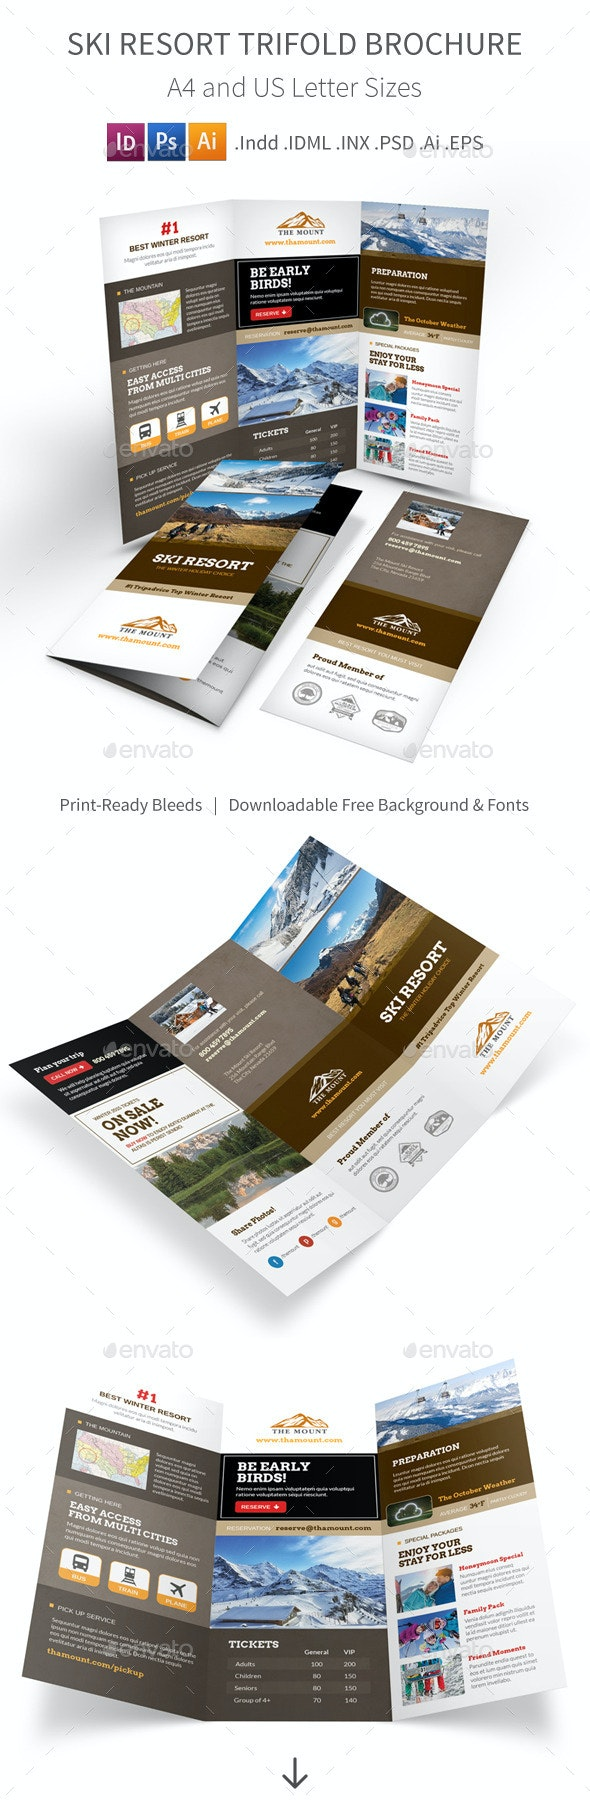 Ski Resort Trifold Brochure - Informational Brochures